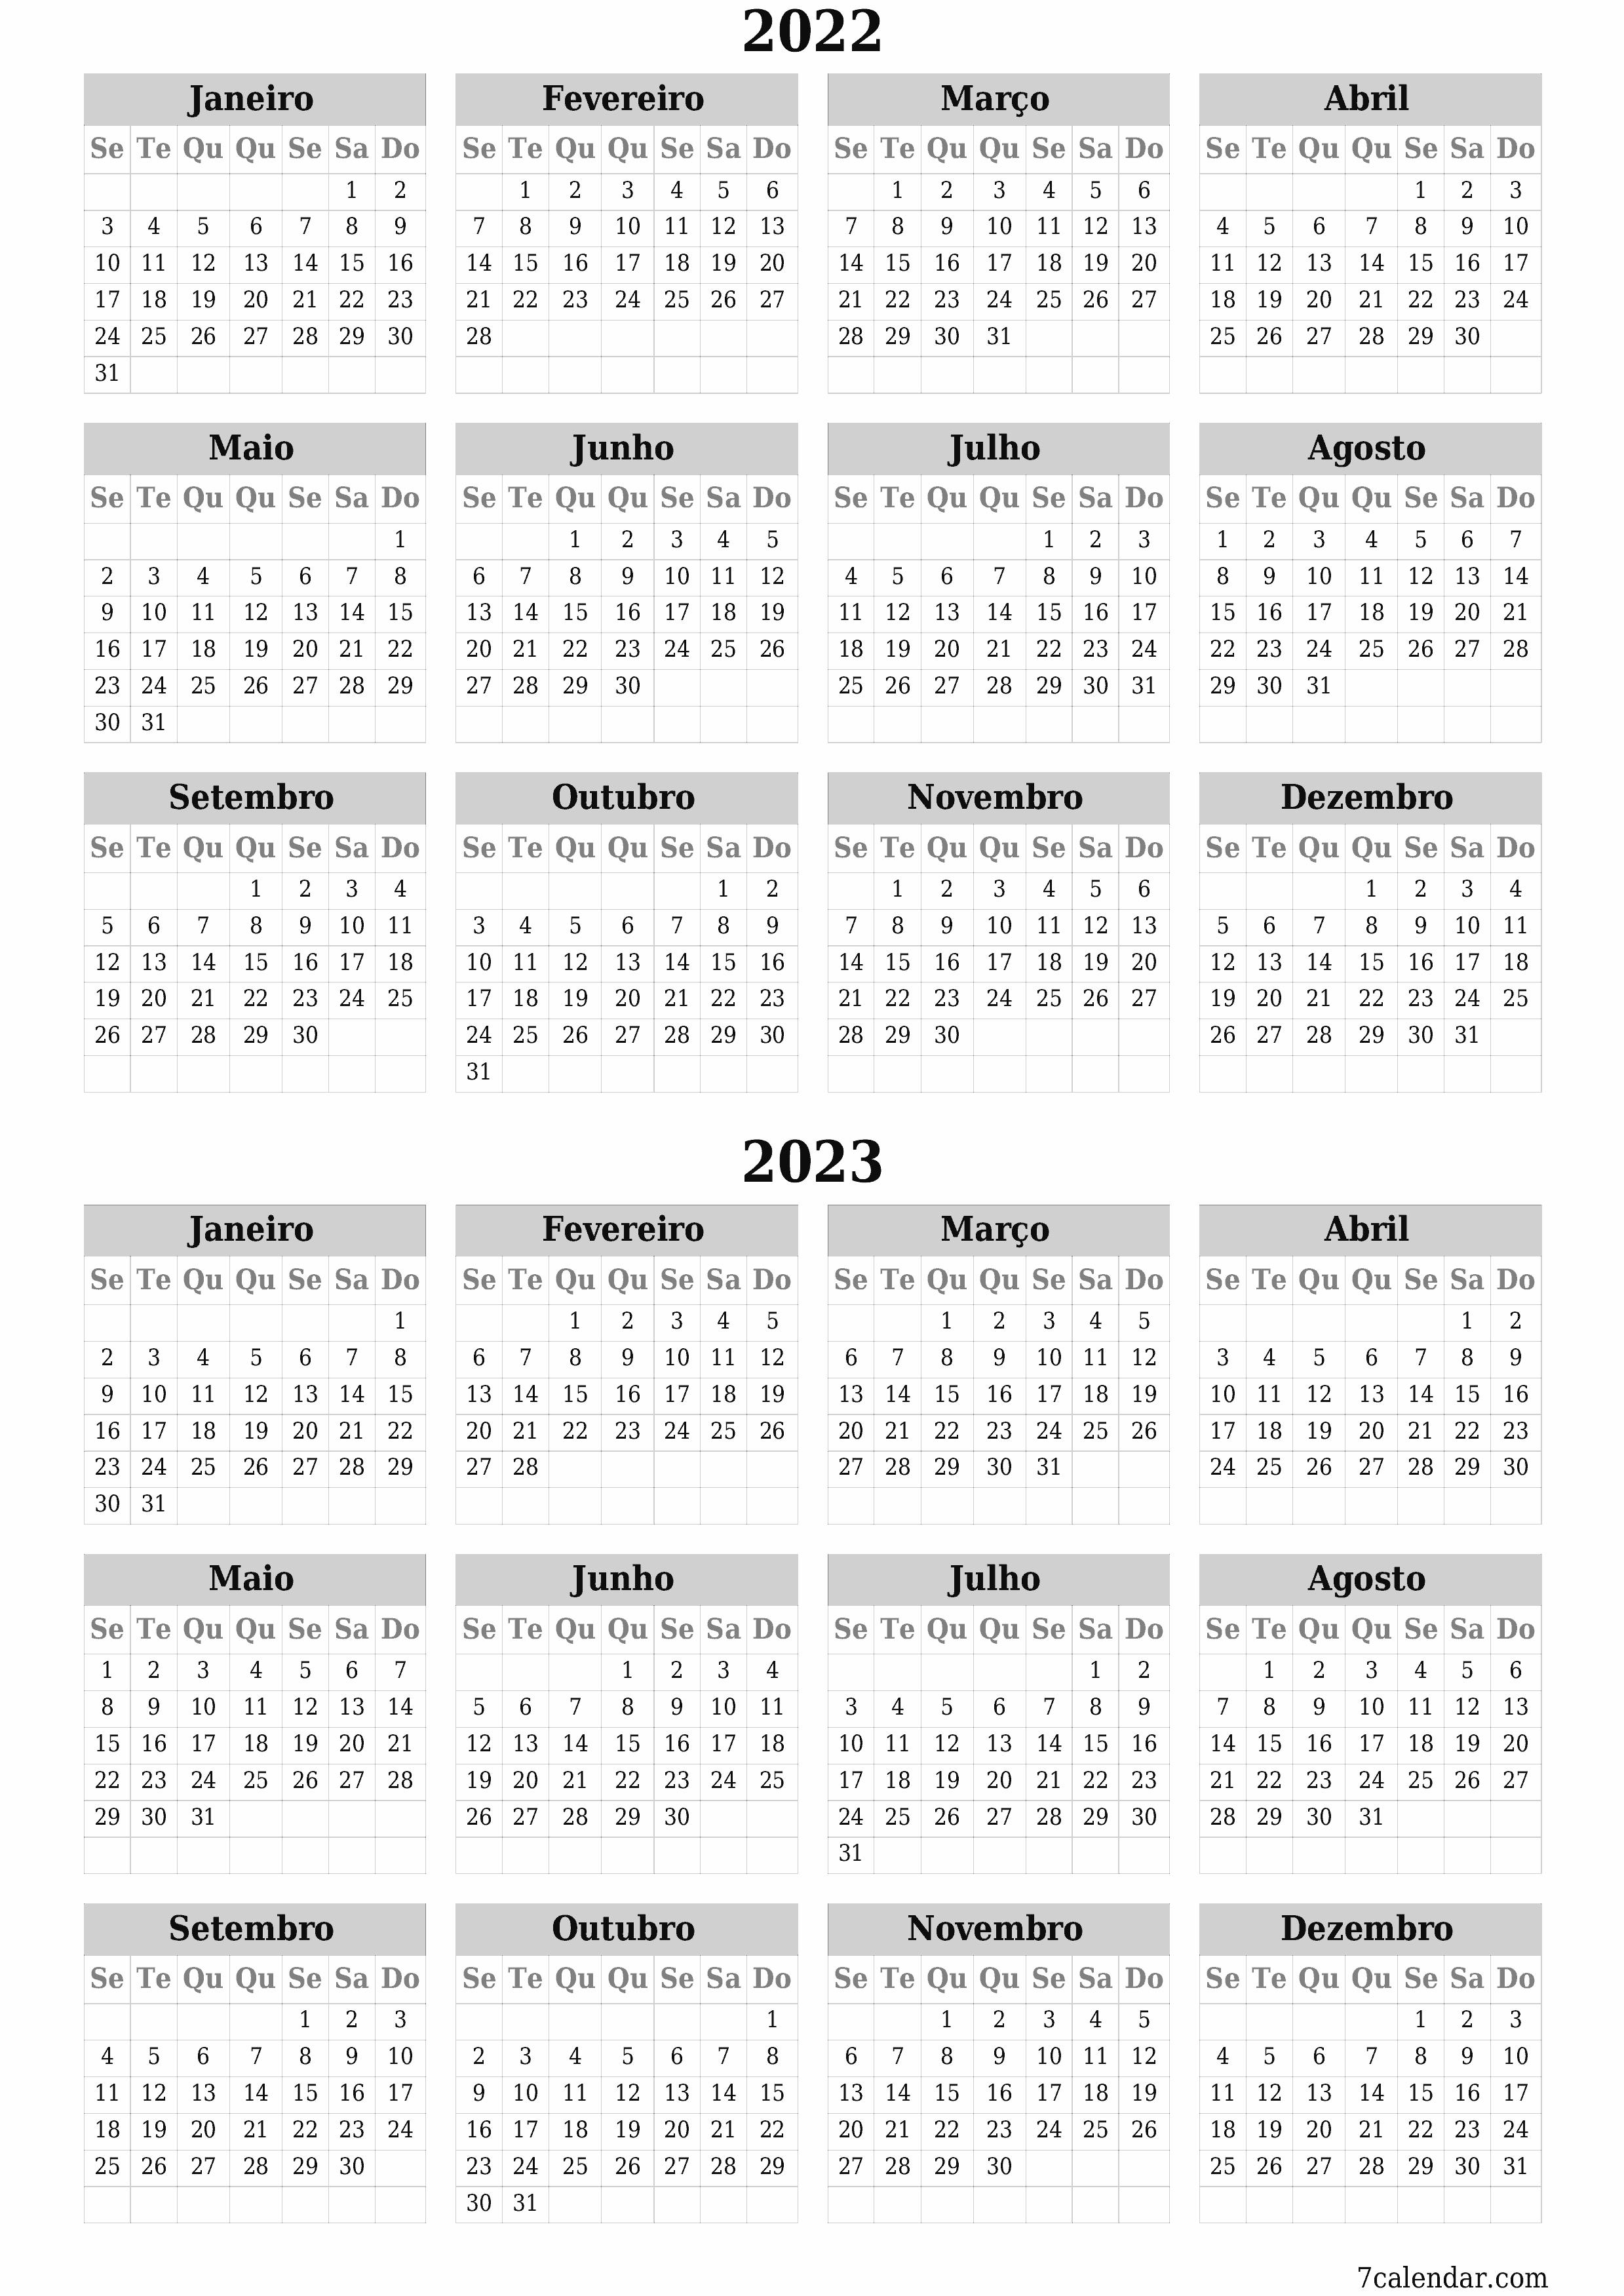 Calendarios E Planejadores Imprimiveis Setembro 2022 A4 A3 Para Pdf E Png 7calendar